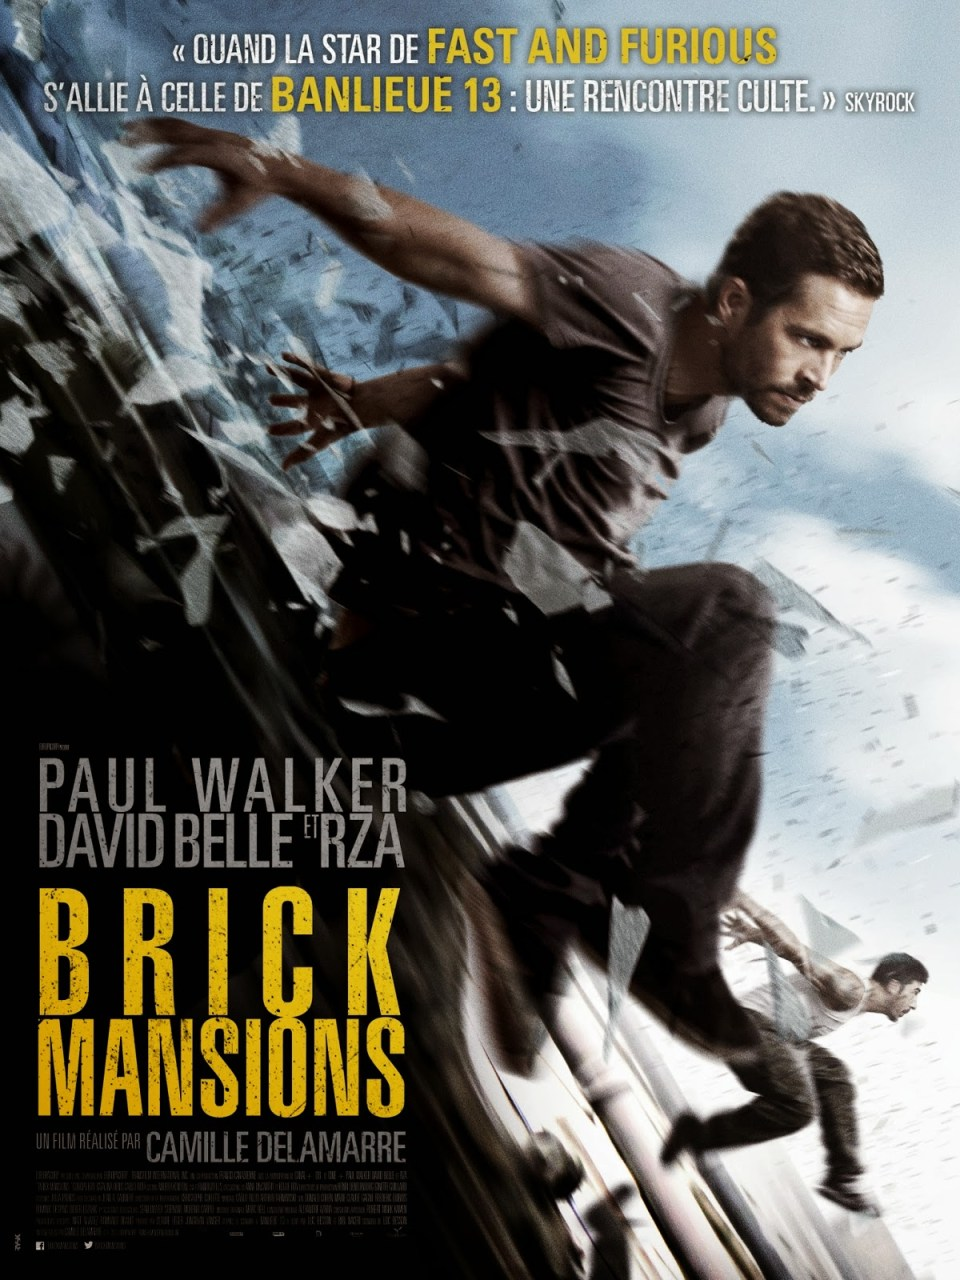 brick_mansions_ver4_xxlg